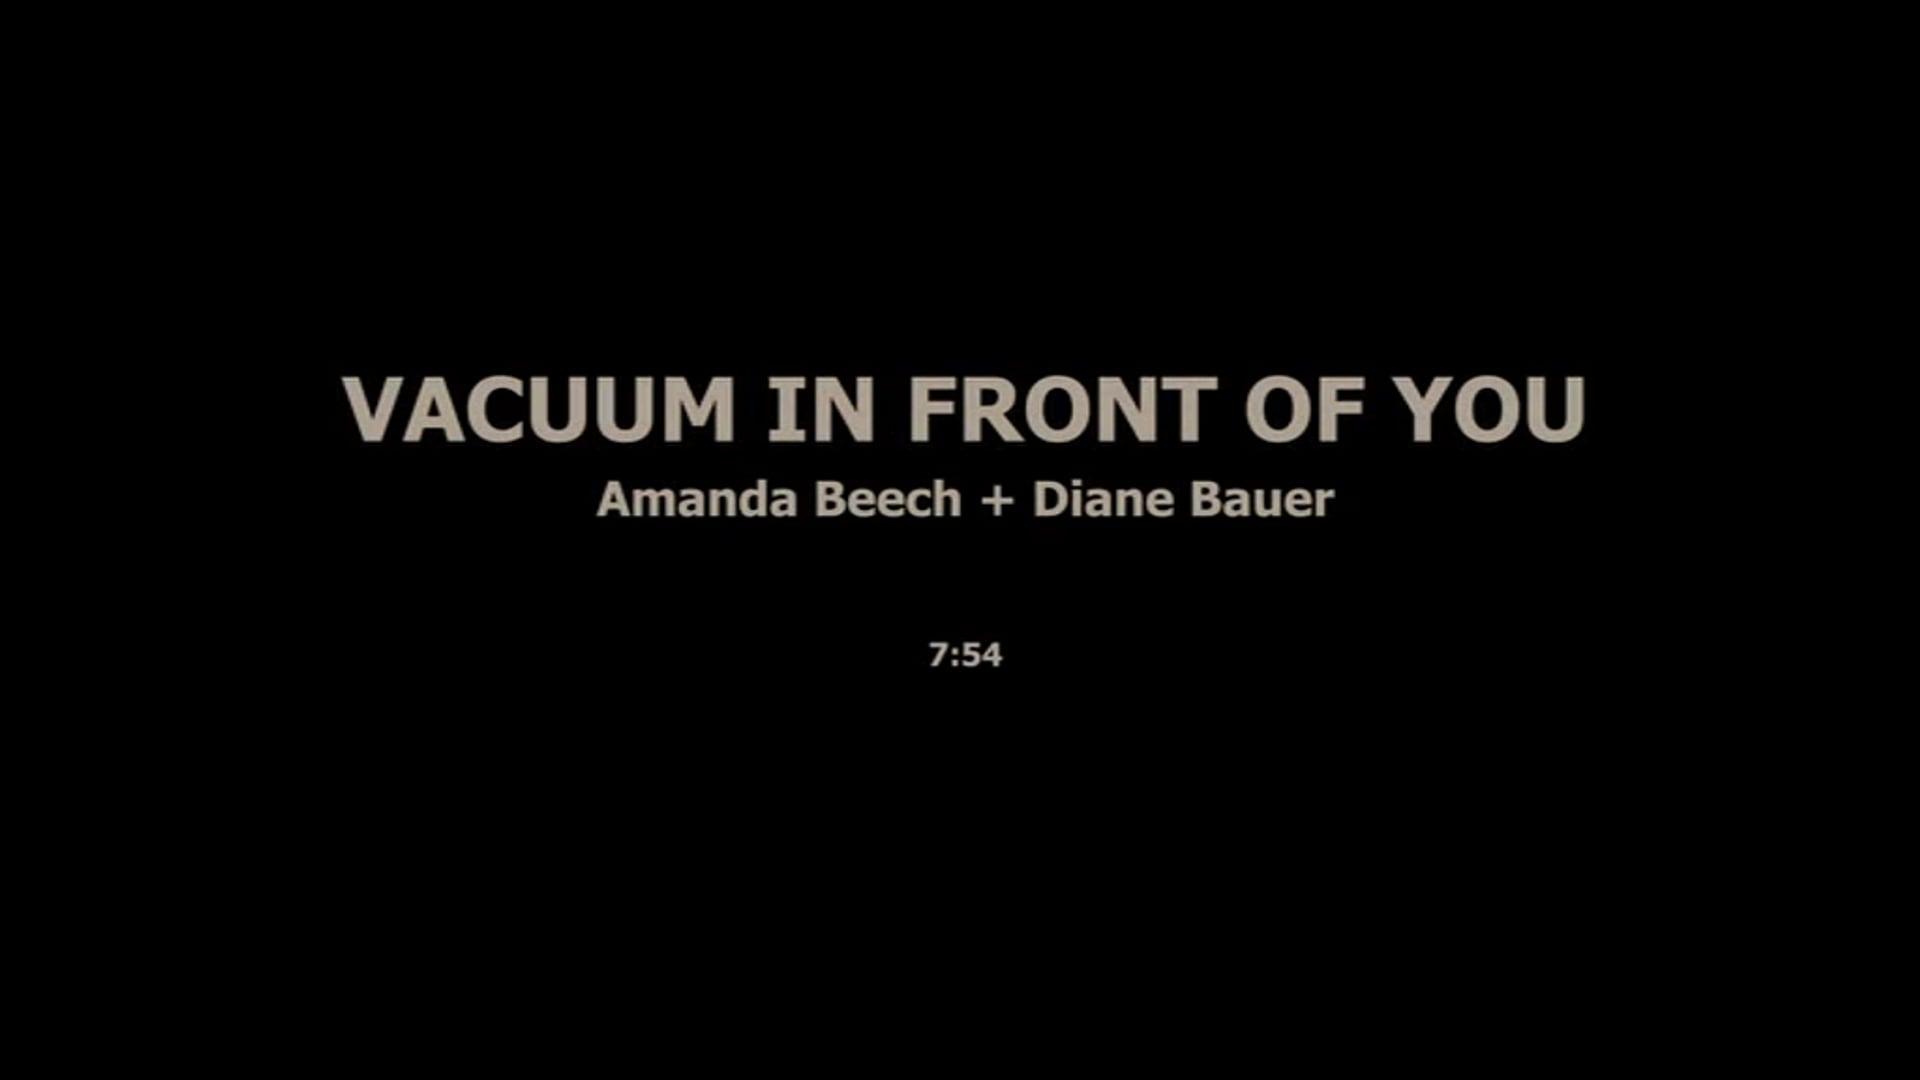 VACUUM IN FRONT OF YOU - AMANDA BEECH, DIANN BAUER